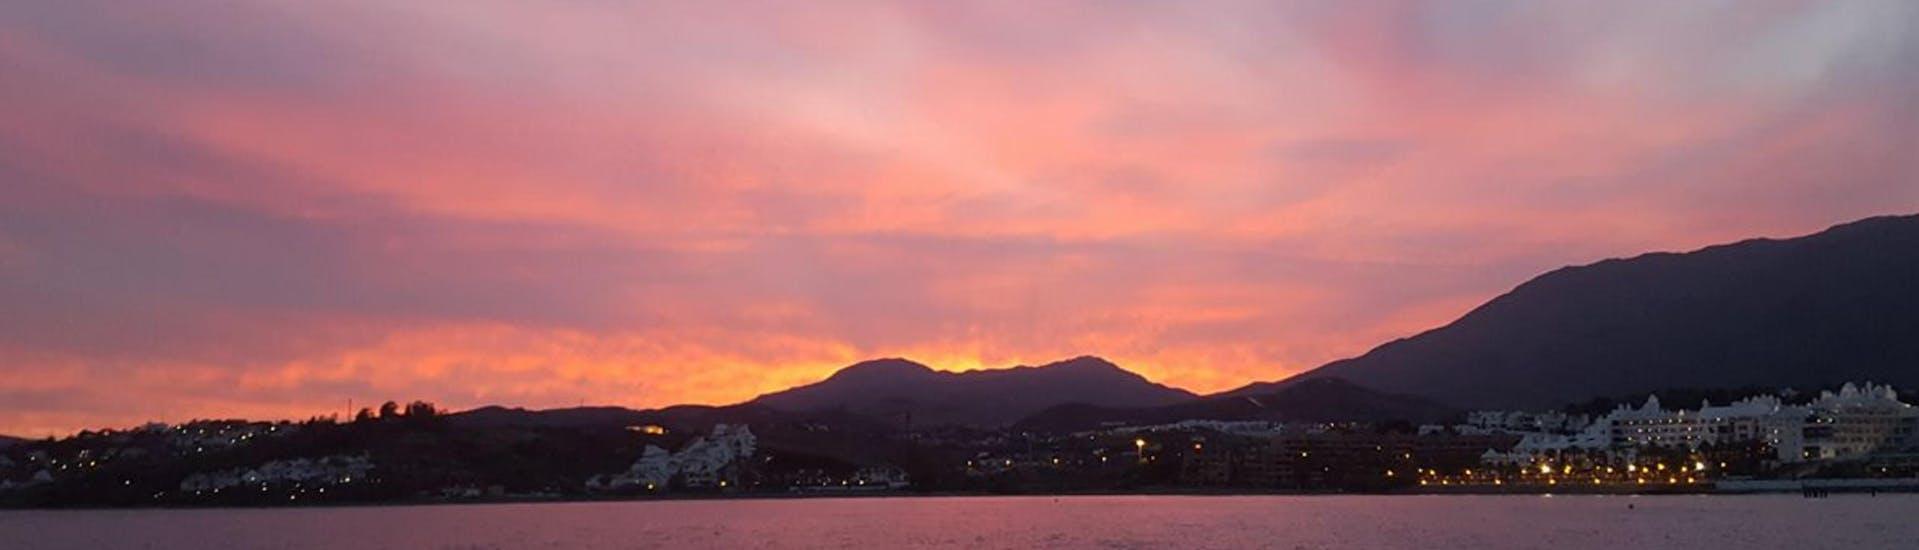 Private Catamaran Sunset & Dolphin Sighting Tour - Estepona